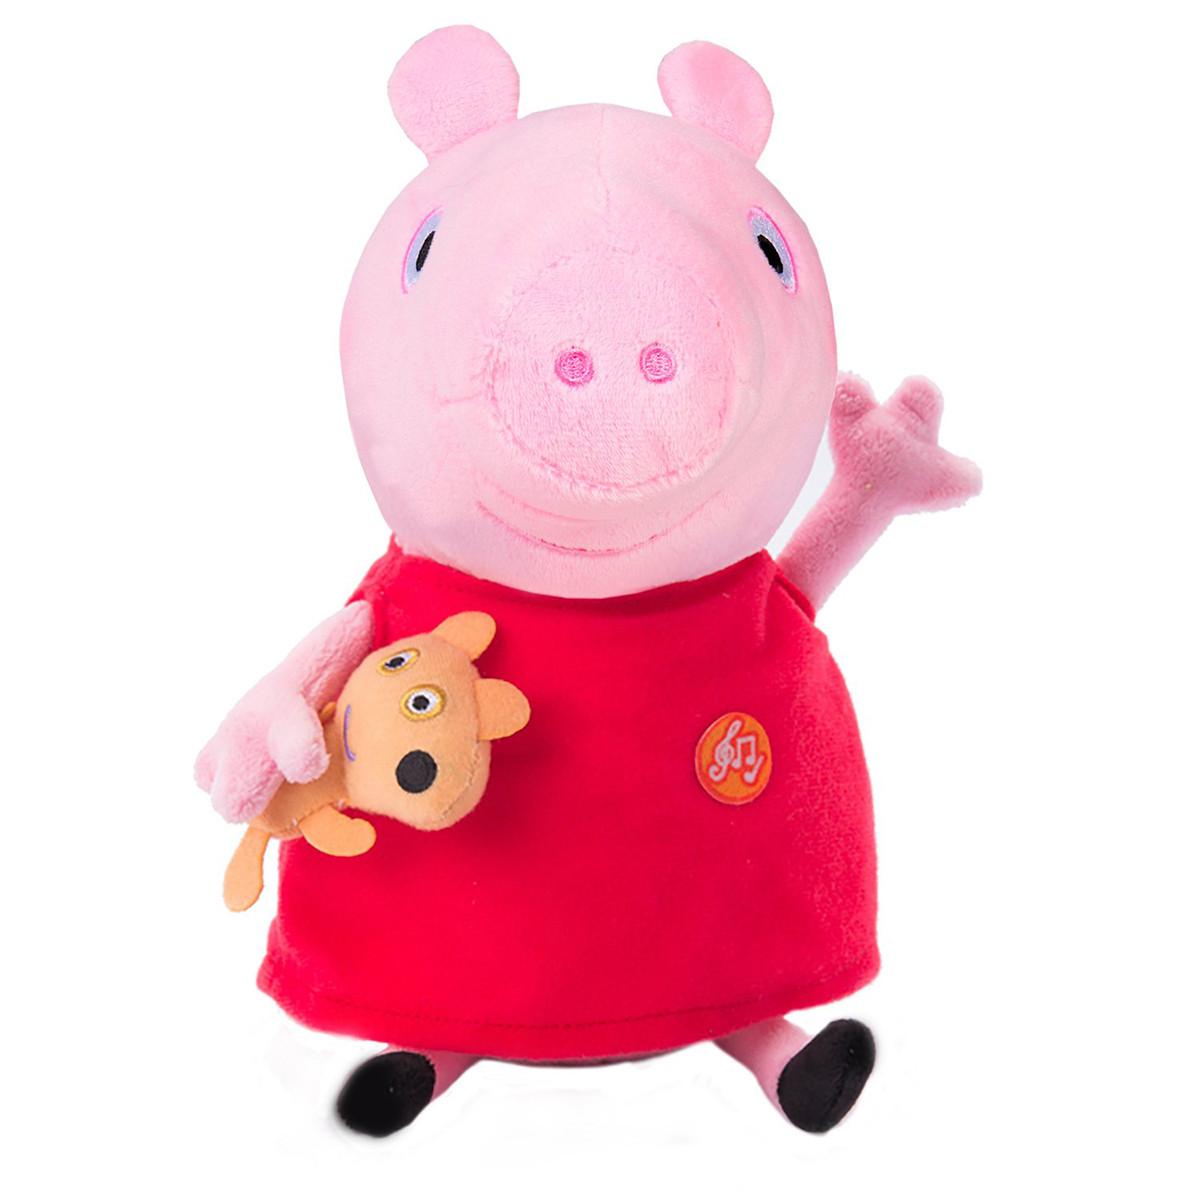 Peppa Мягкая озвученная игрушка - Пеппа с игрушкой, 30 см, 30117